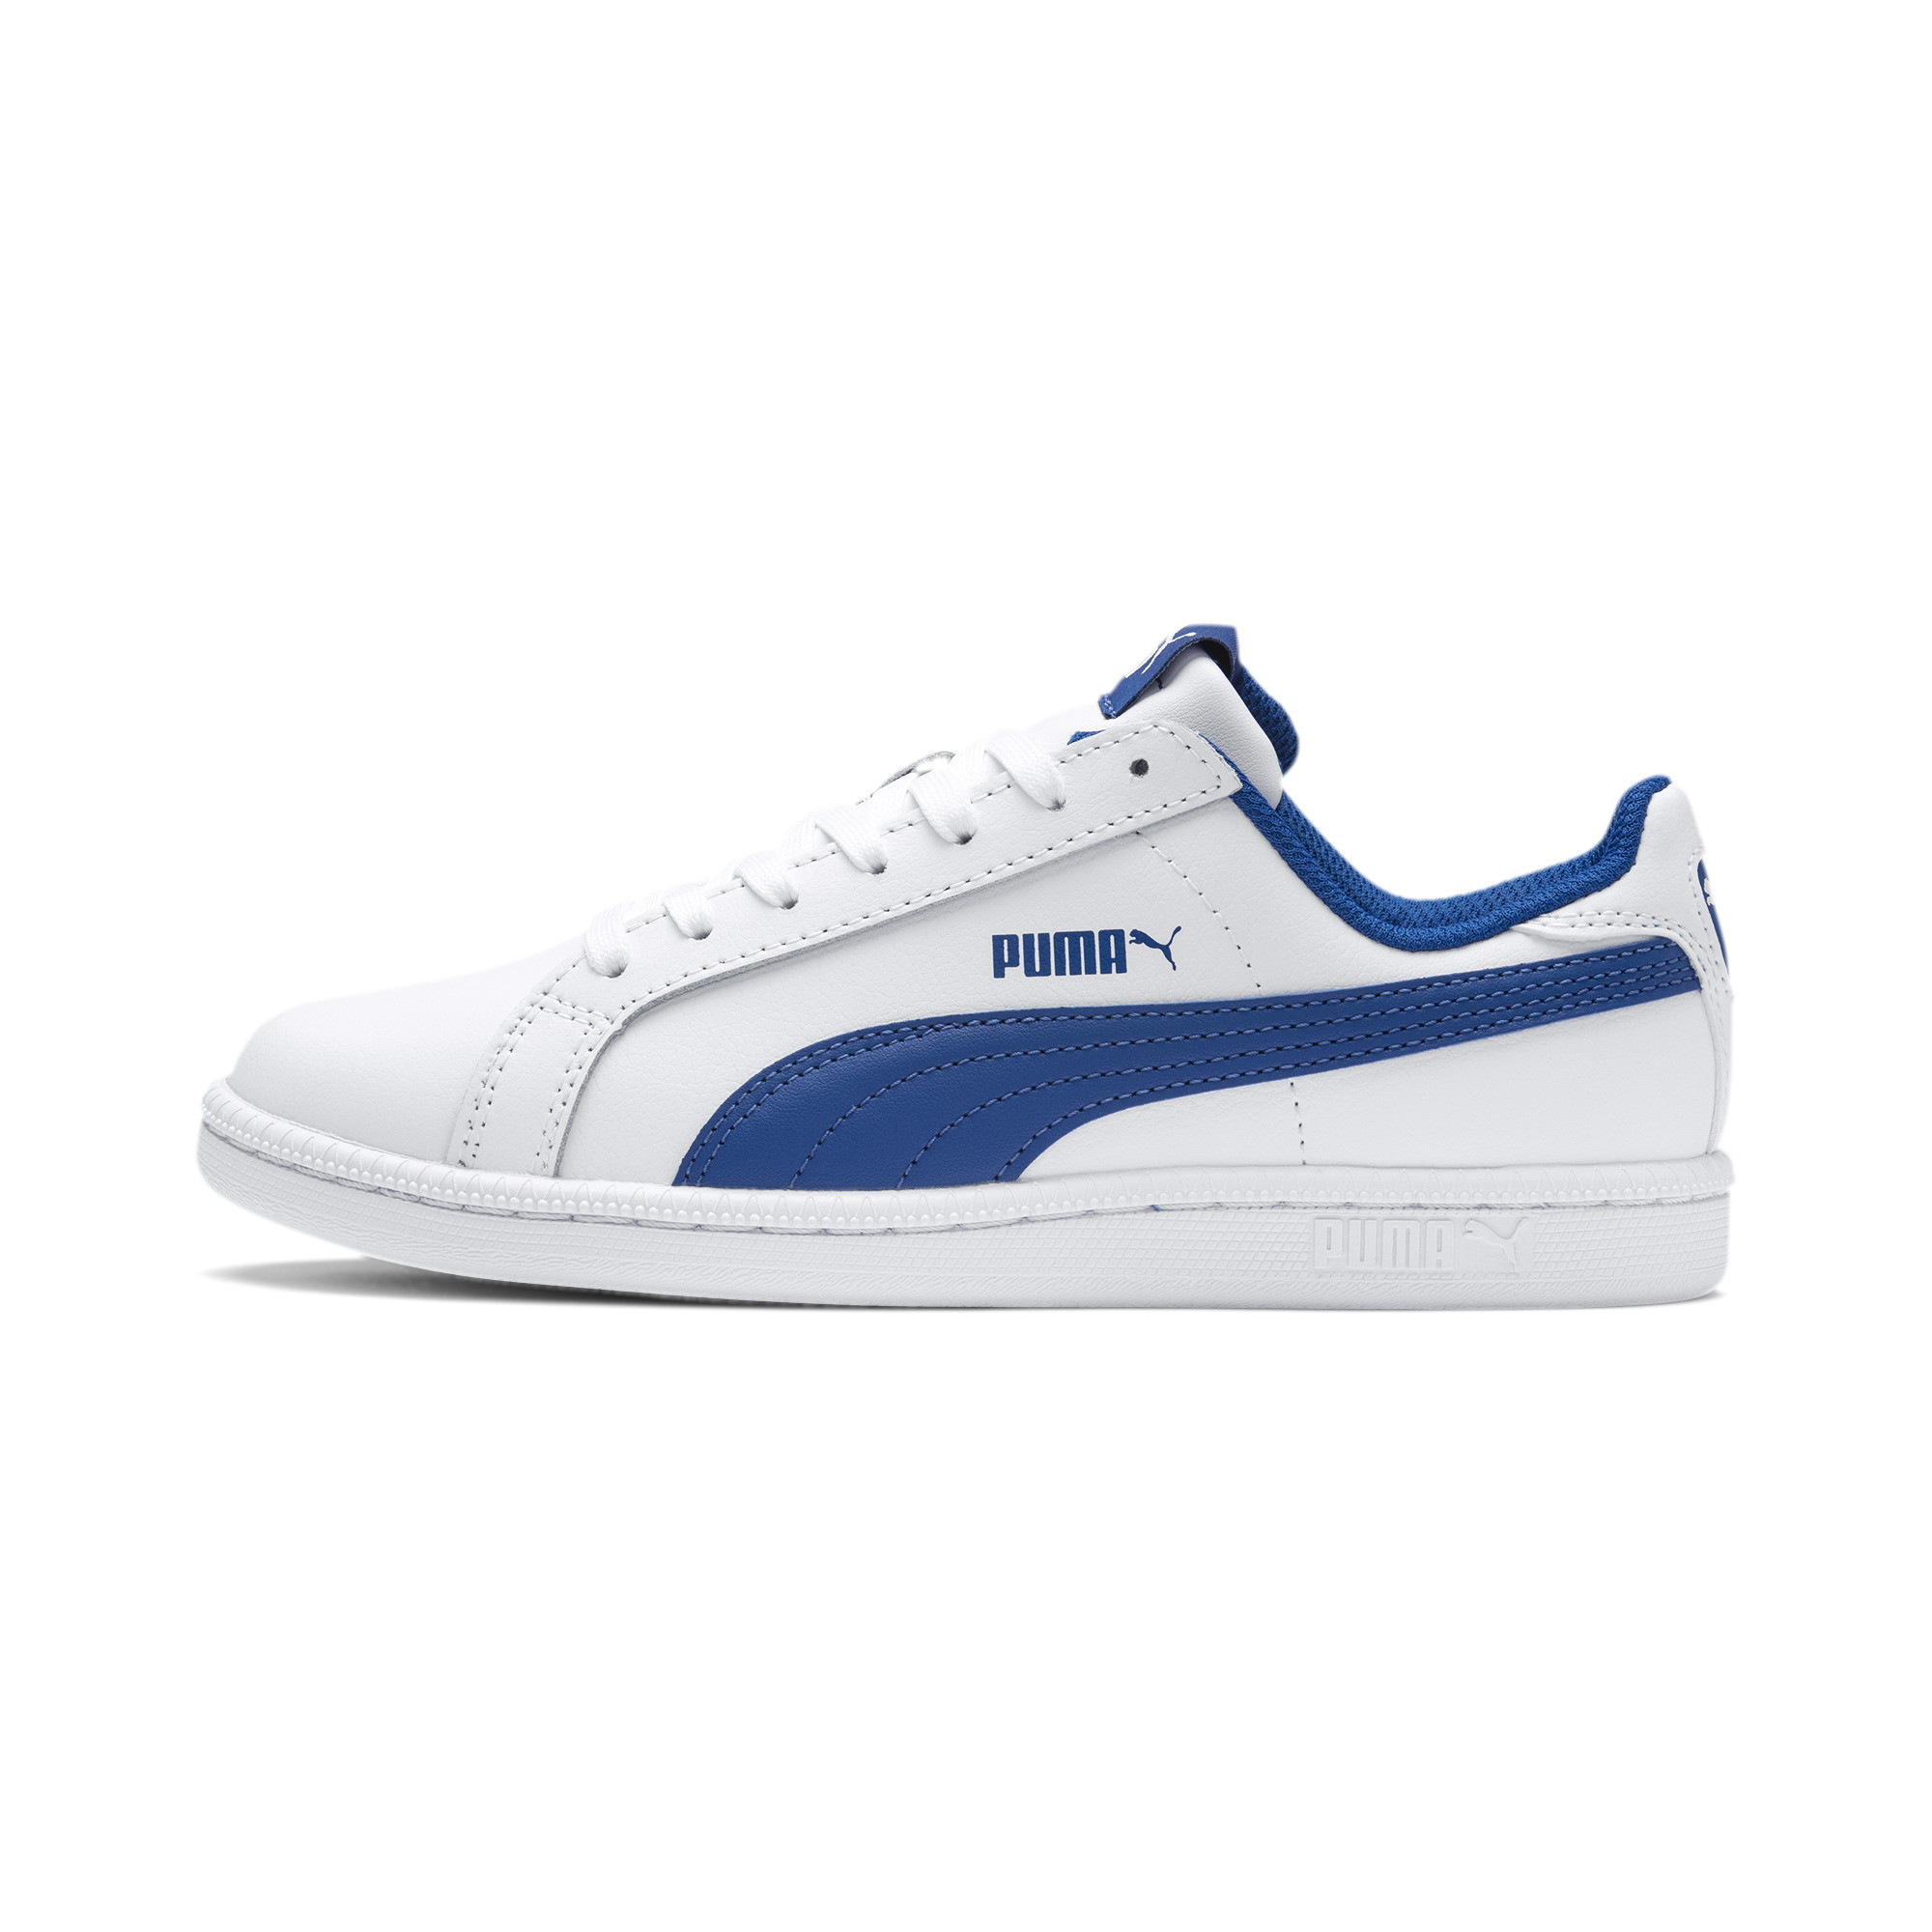 PUMA-Smash-Jr-Sneaker-Unisex-Schuhe-Kinder-Neu Indexbild 14